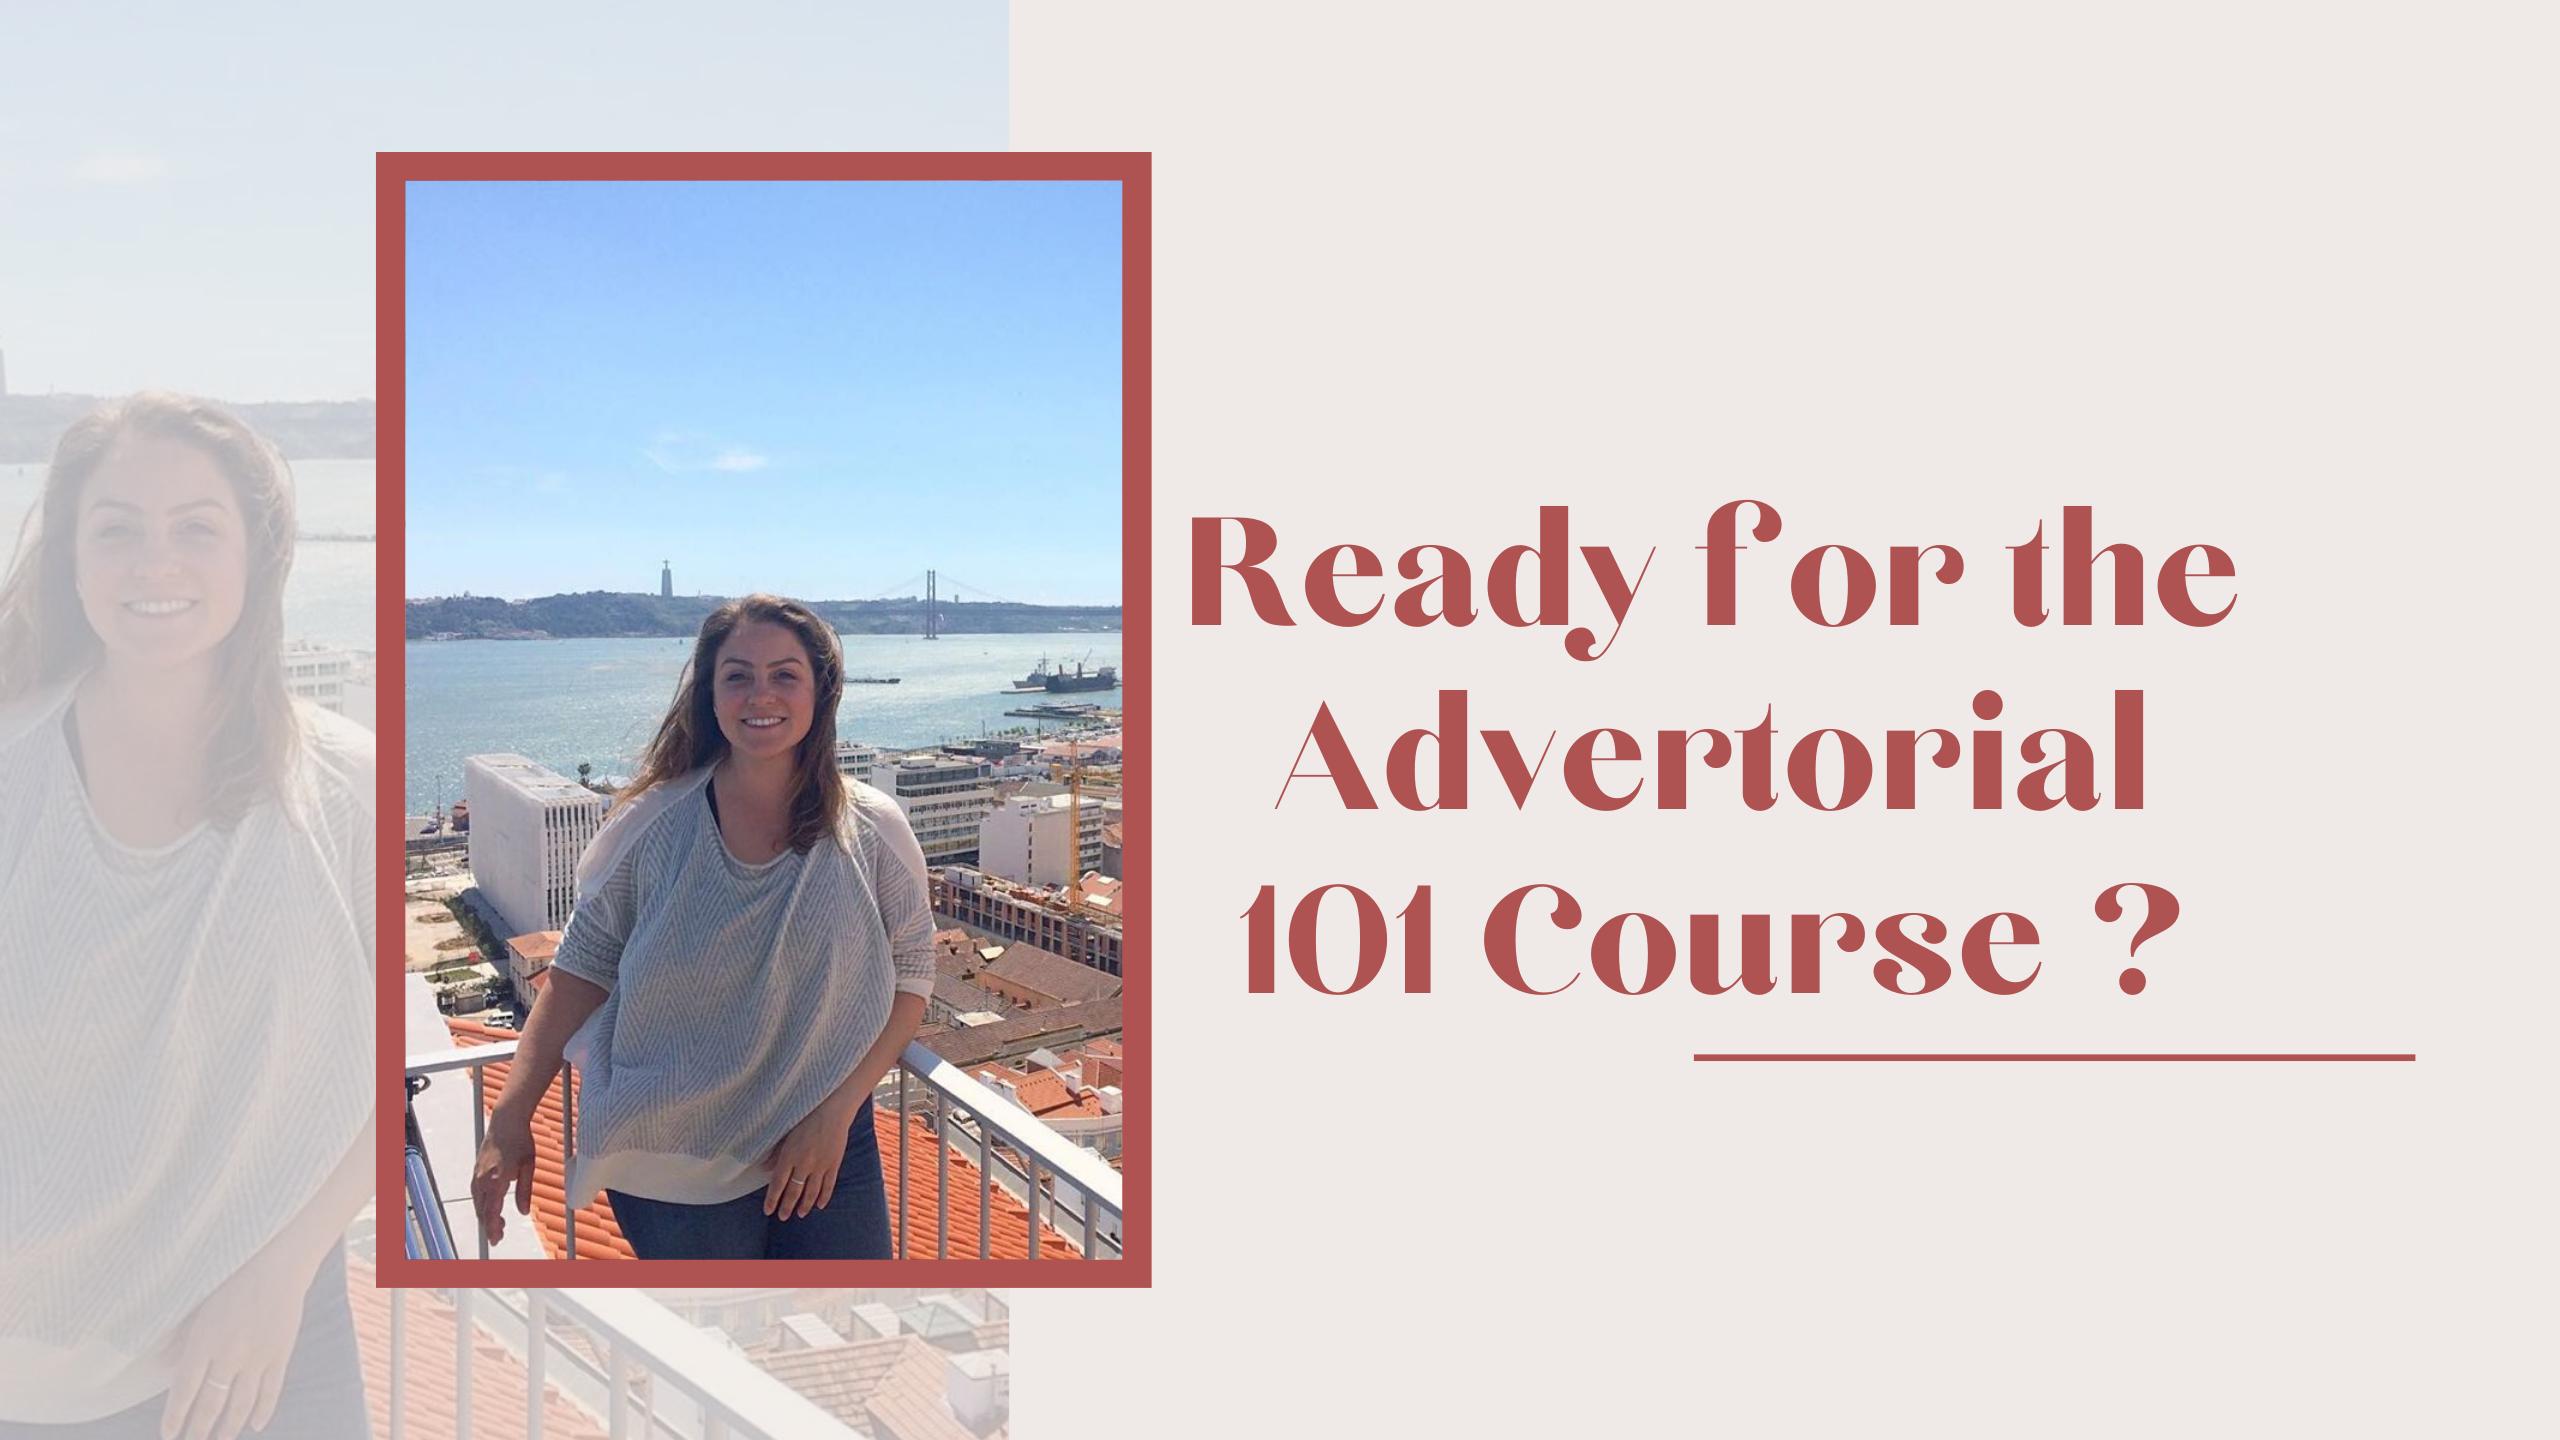 Advertorial 101 Course Open Next Week